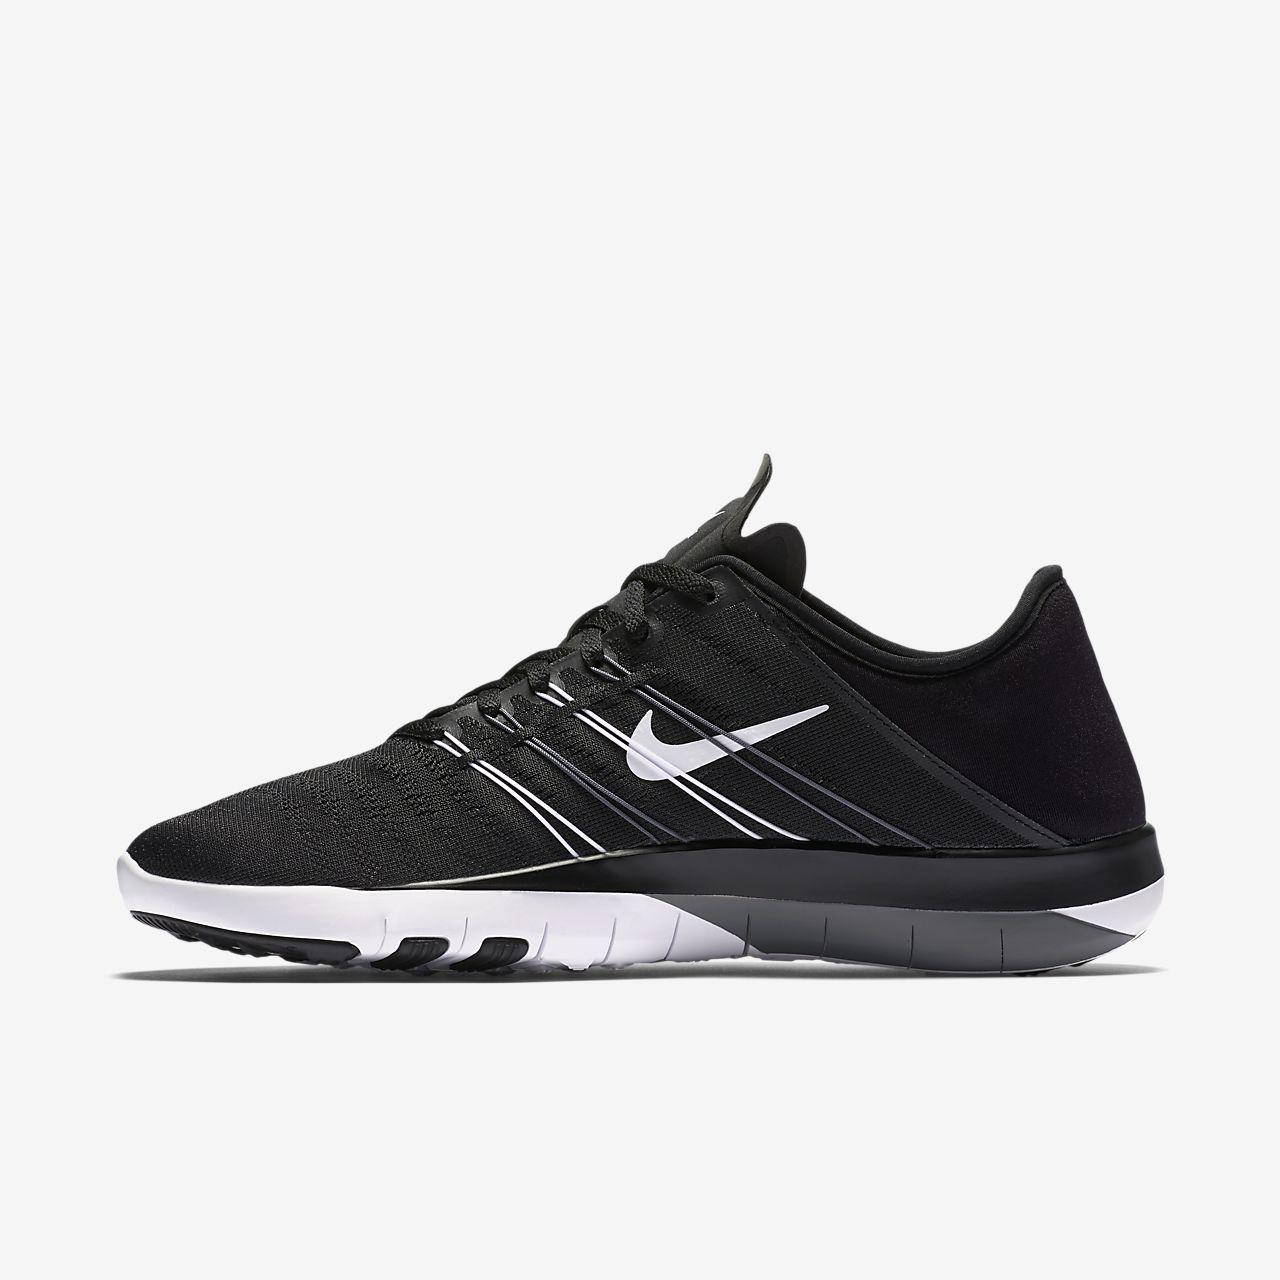 Da Donna Nero Scarpe Da Ginnastica Nike Taglia 6